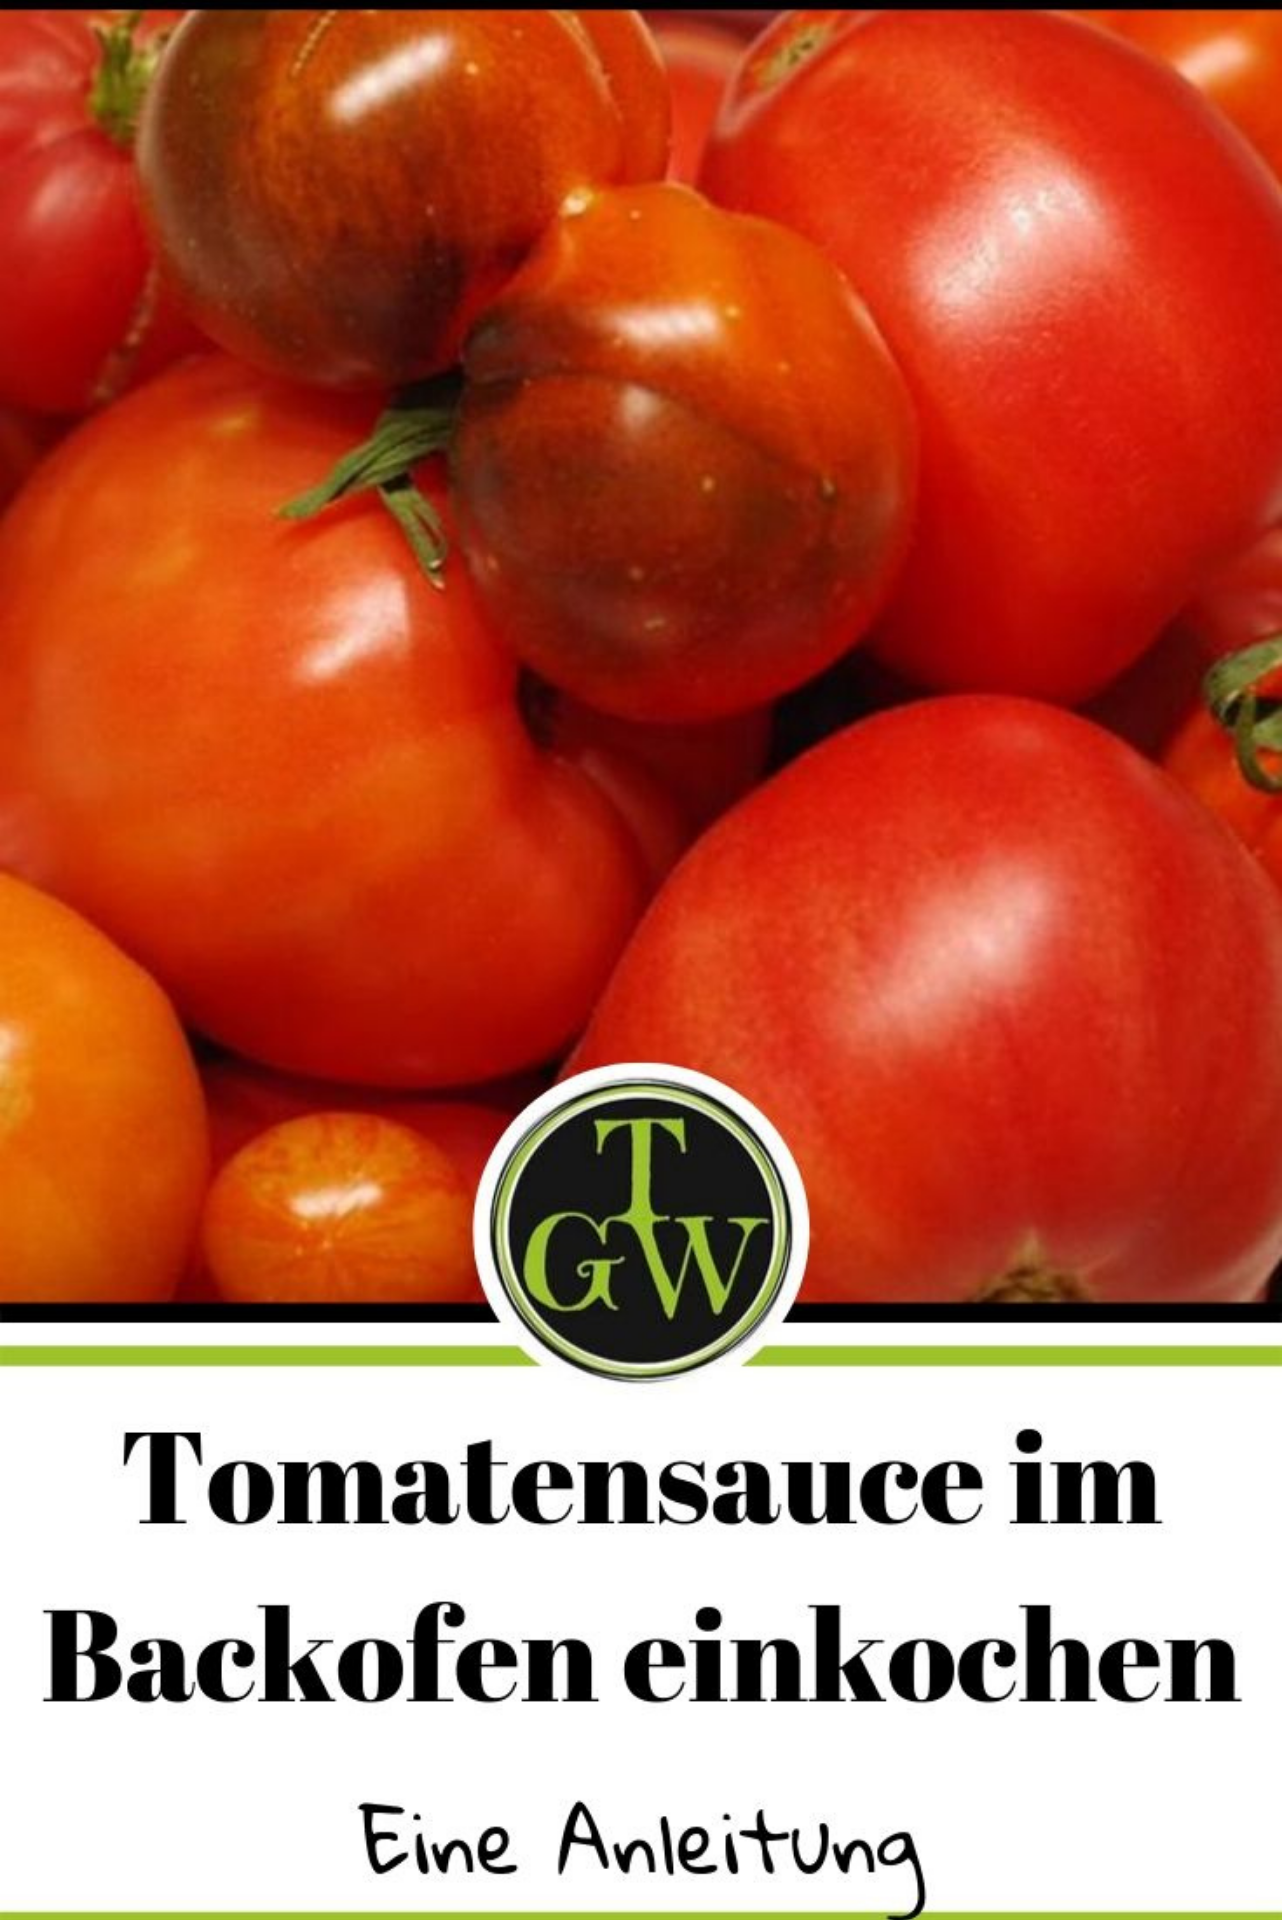 Tomatensugo im Backofen einkochen